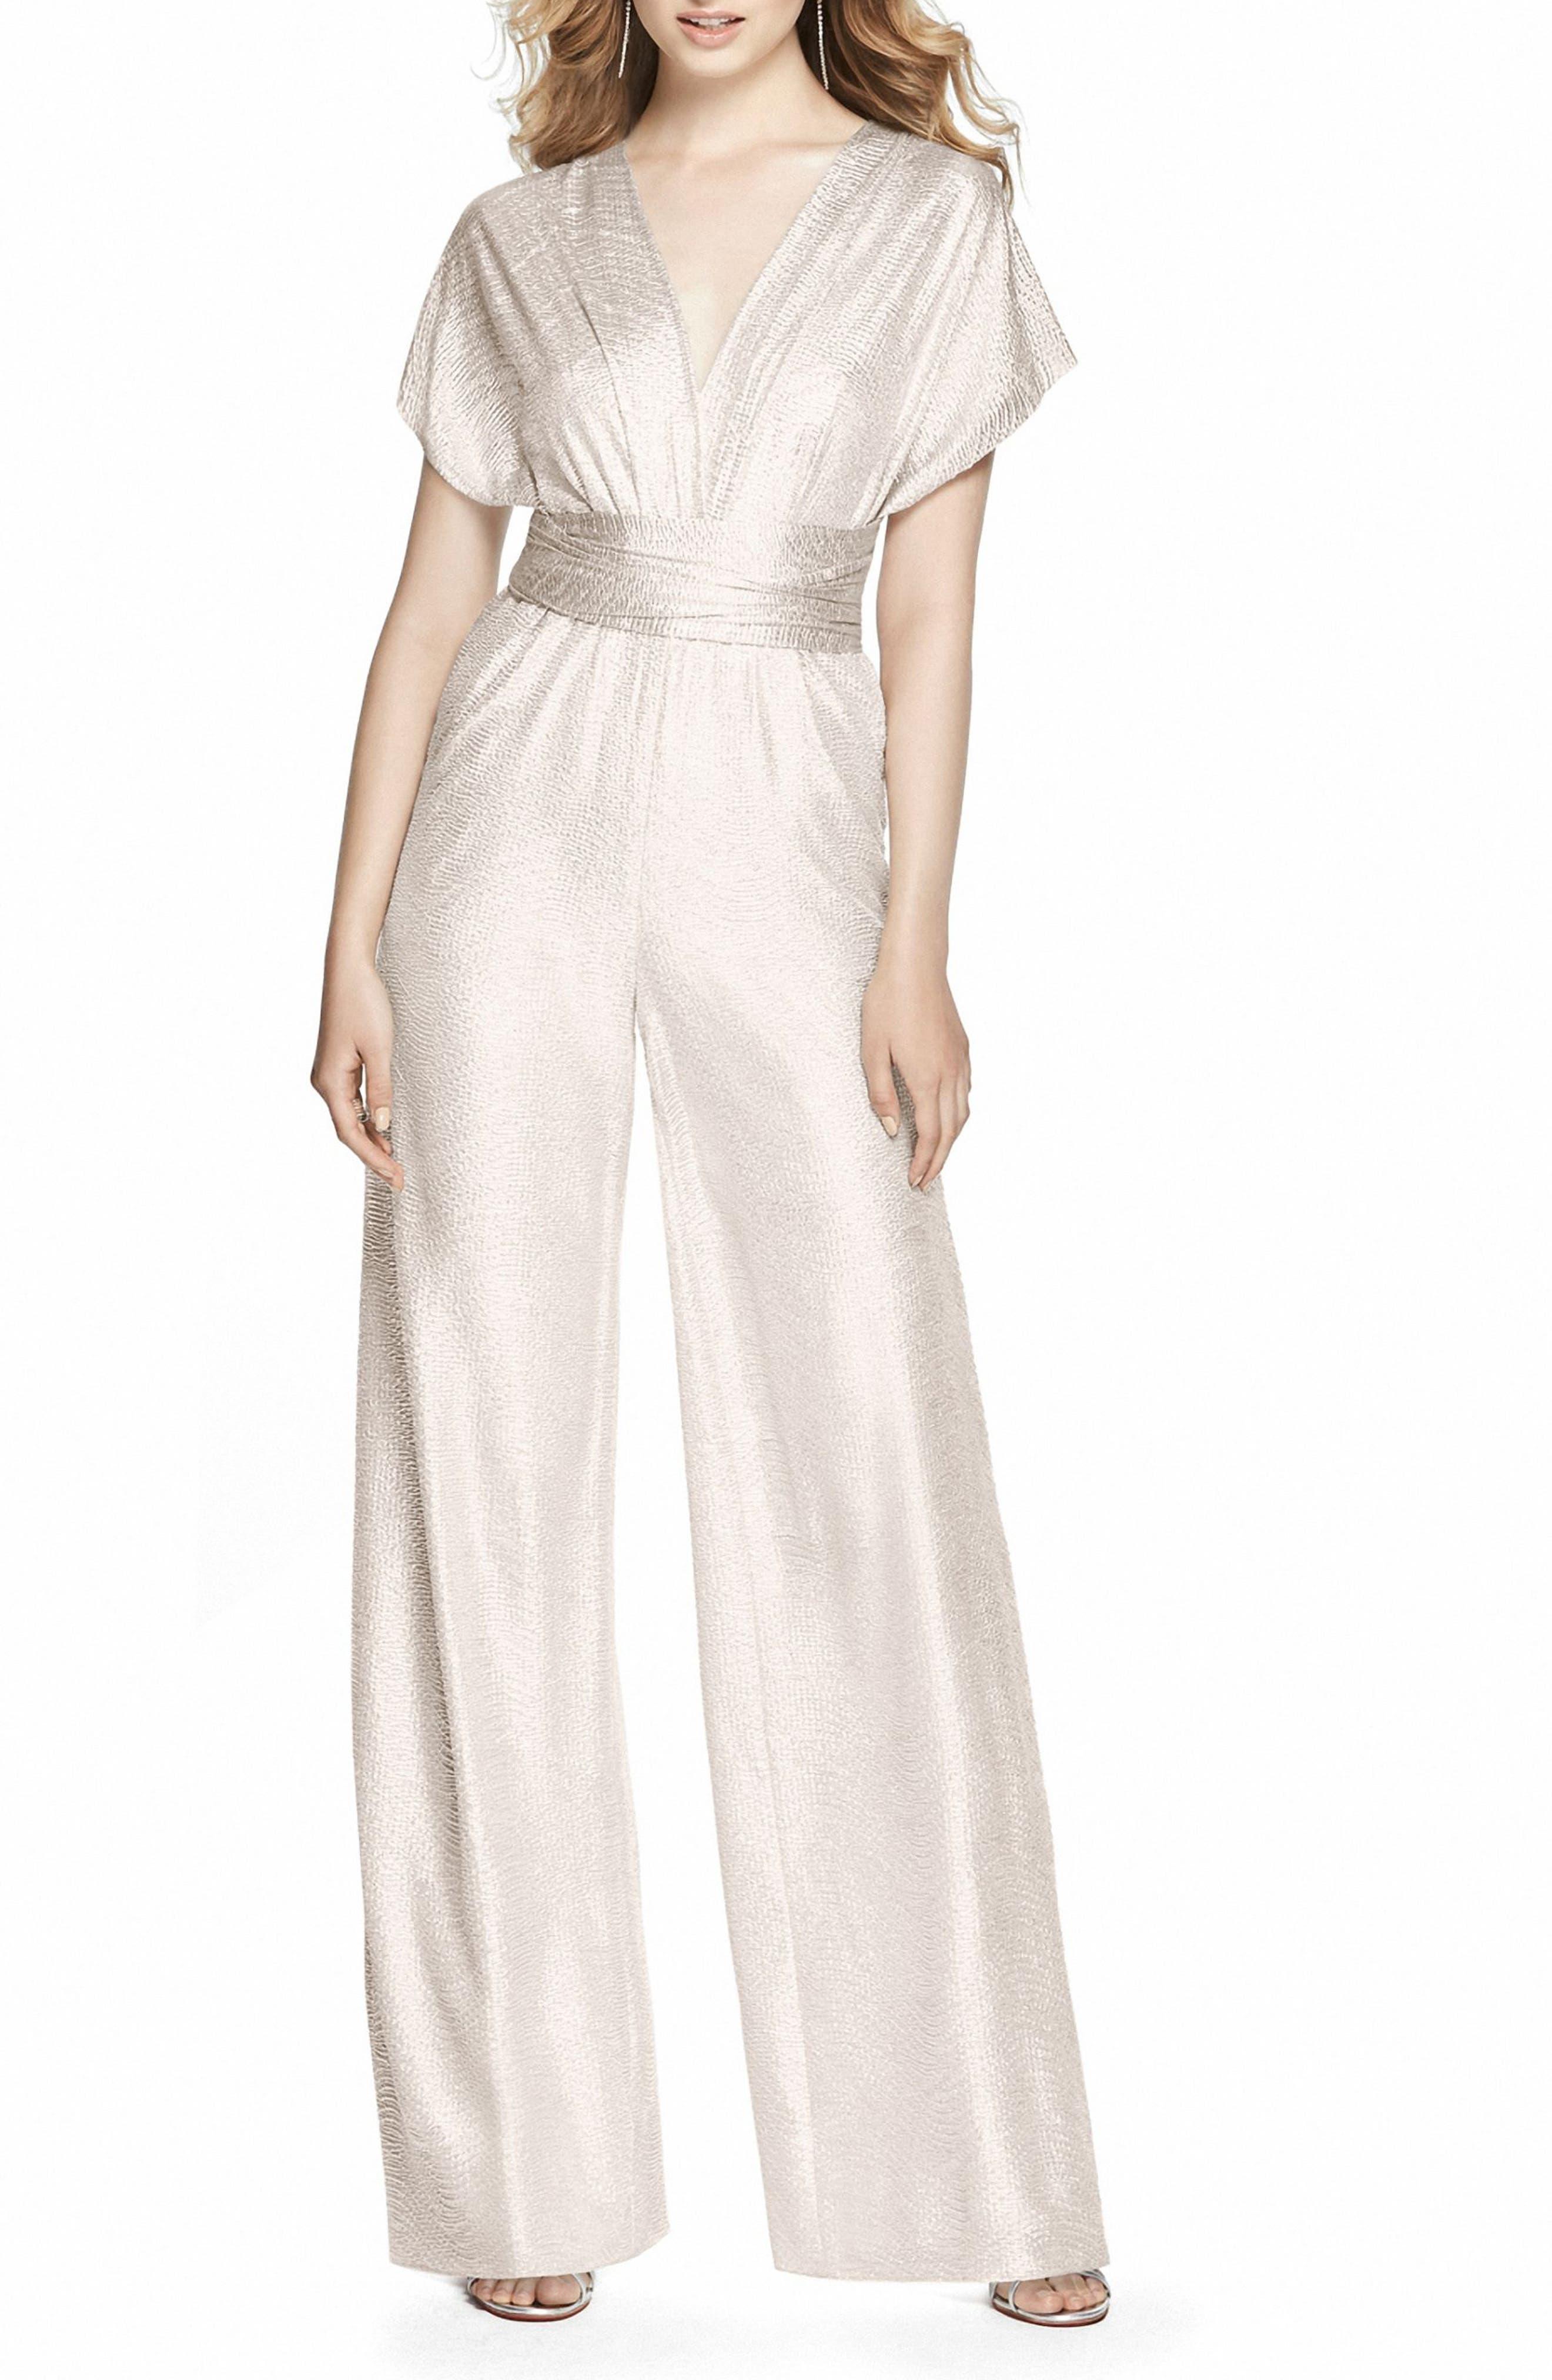 Vintage Inspired Wedding Dress | Vintage Style Wedding Dresses Womens Dessy Collection Twist Convertible Wide Leg Jumpsuit Size Medium - Metallic $168.00 AT vintagedancer.com